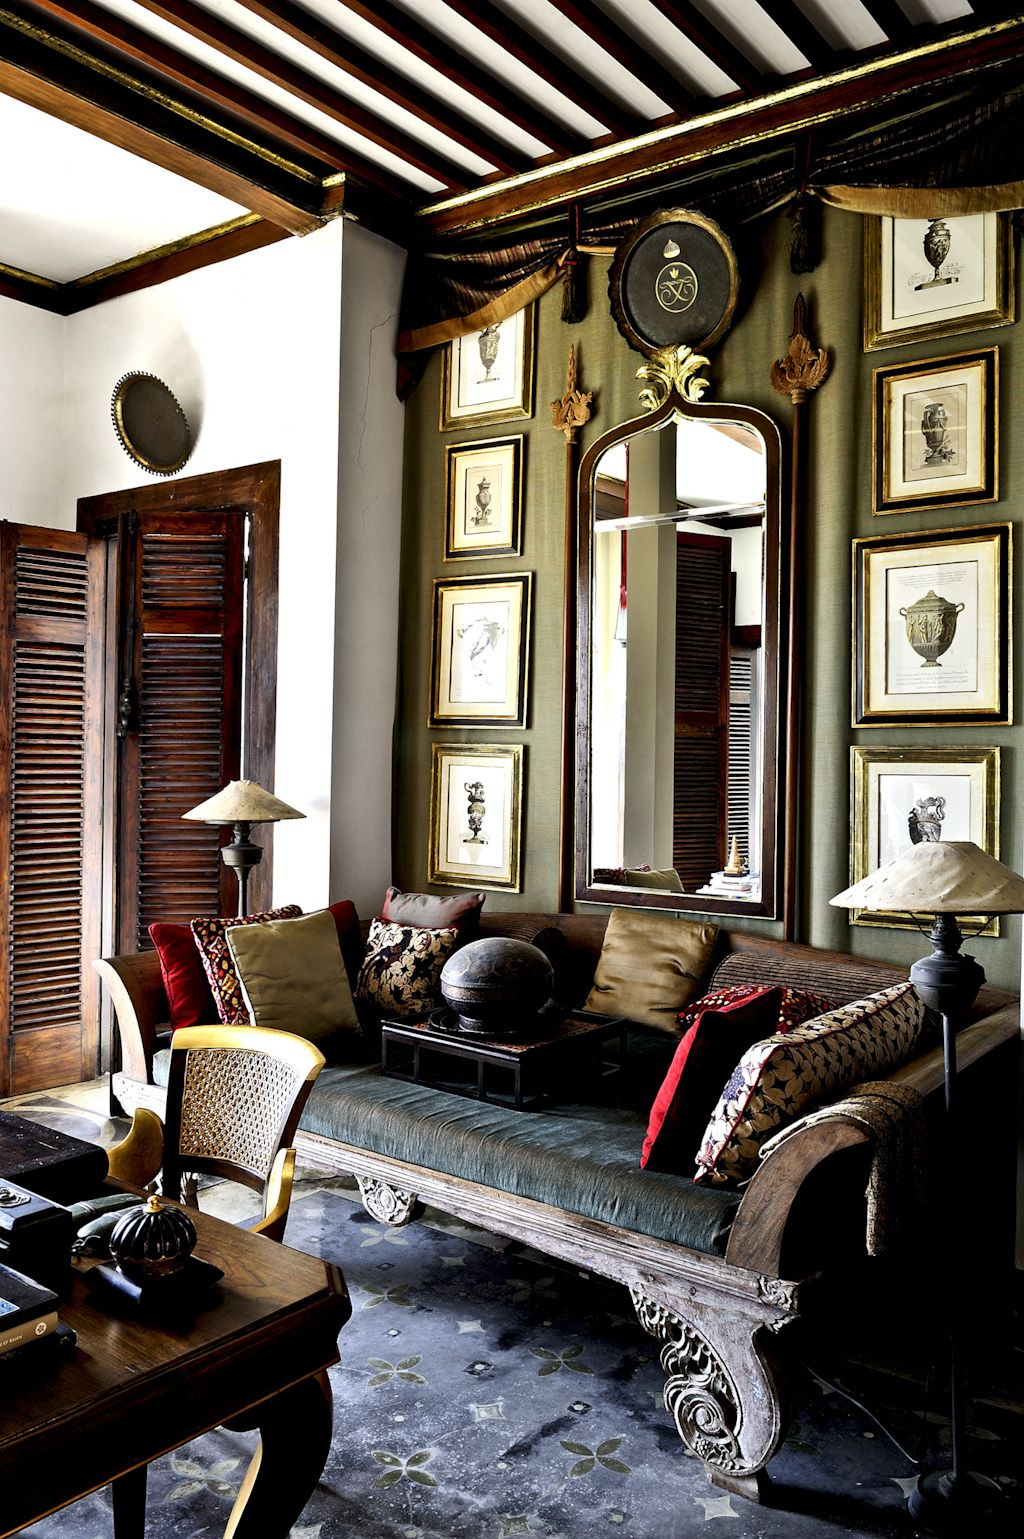 Living Room Designed By Jaya Ibrahim In Cipicong Java Indonesia Interior Arsitektur Kolonial Desain Rumah